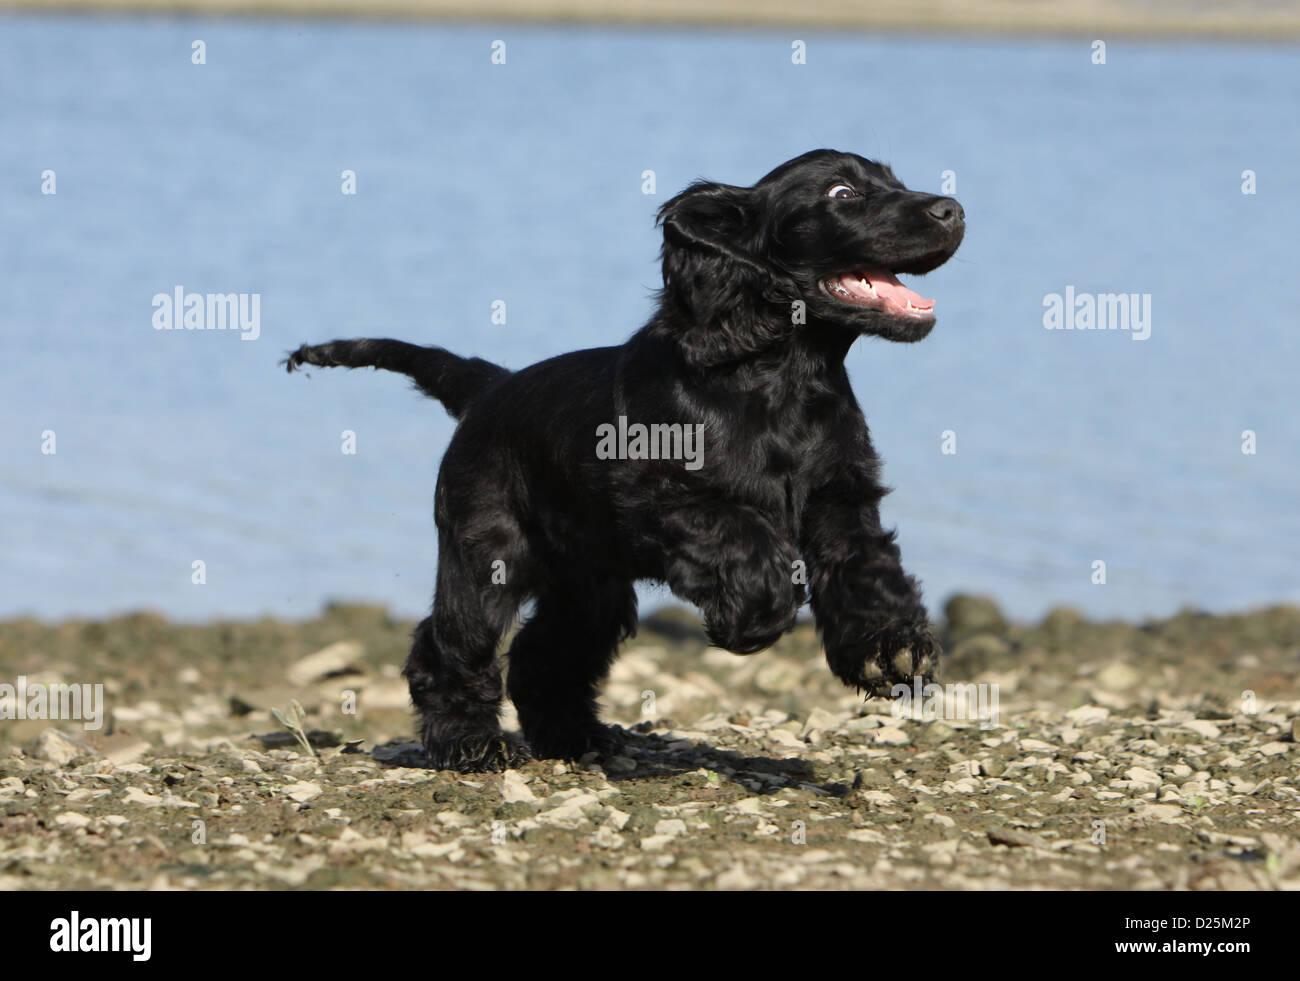 dog english cocker spaniel puppy black running on a